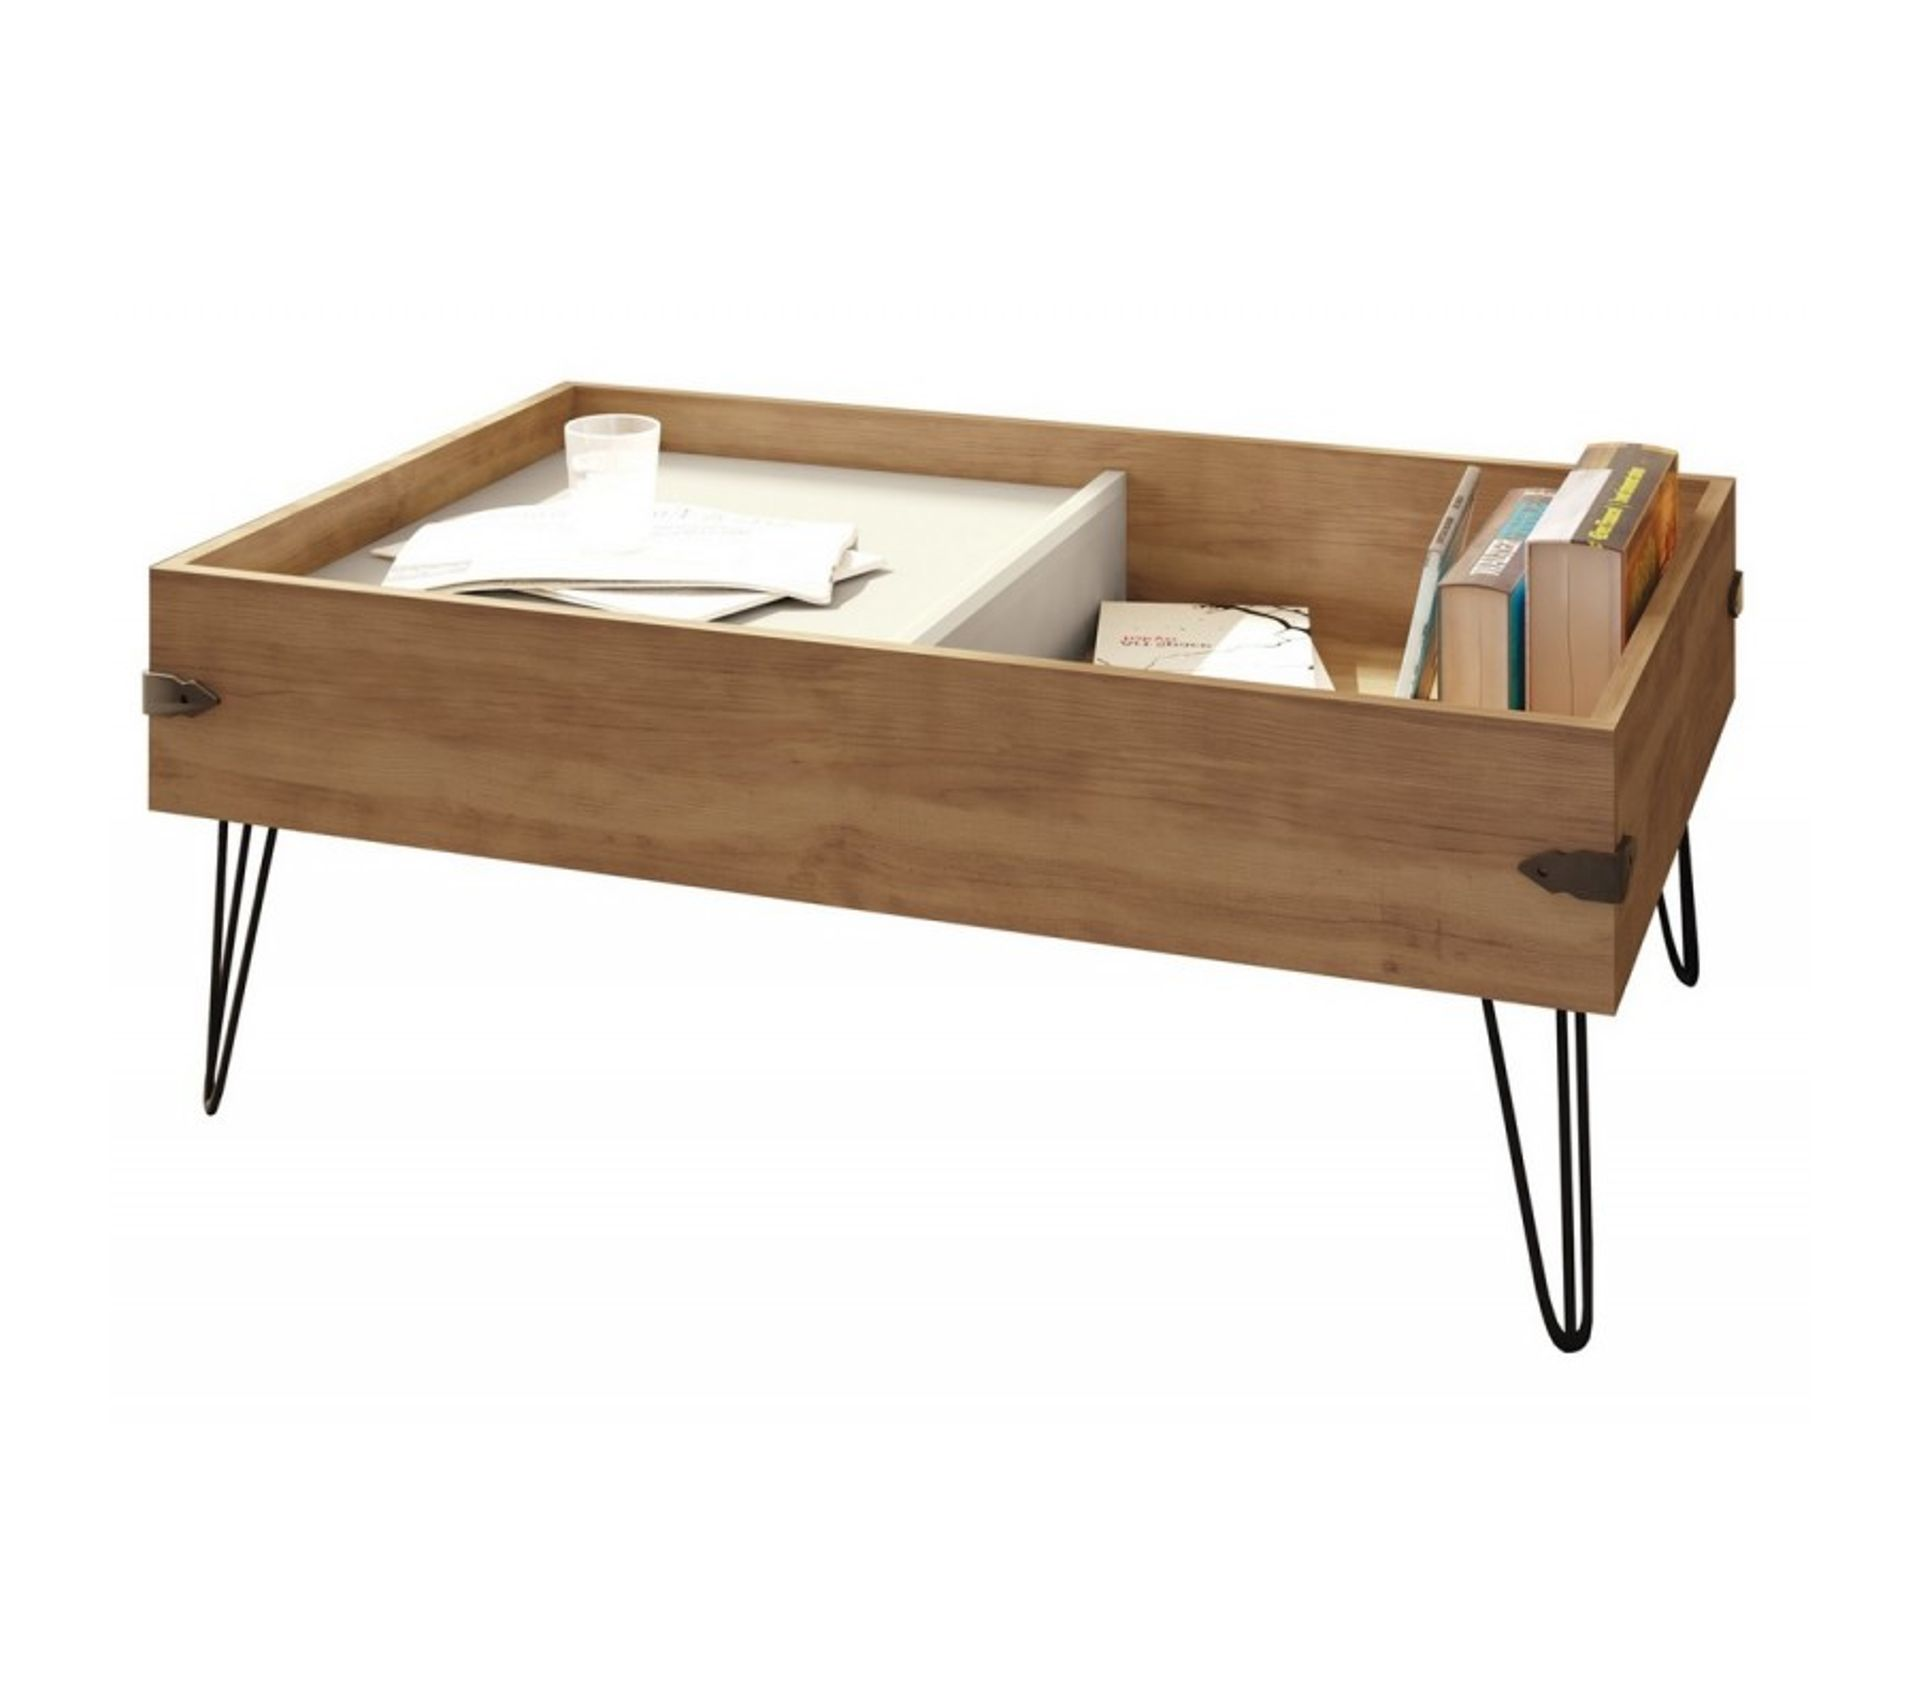 Table Basse Chene 1 Tiroir Pieds Metal Table Basse But